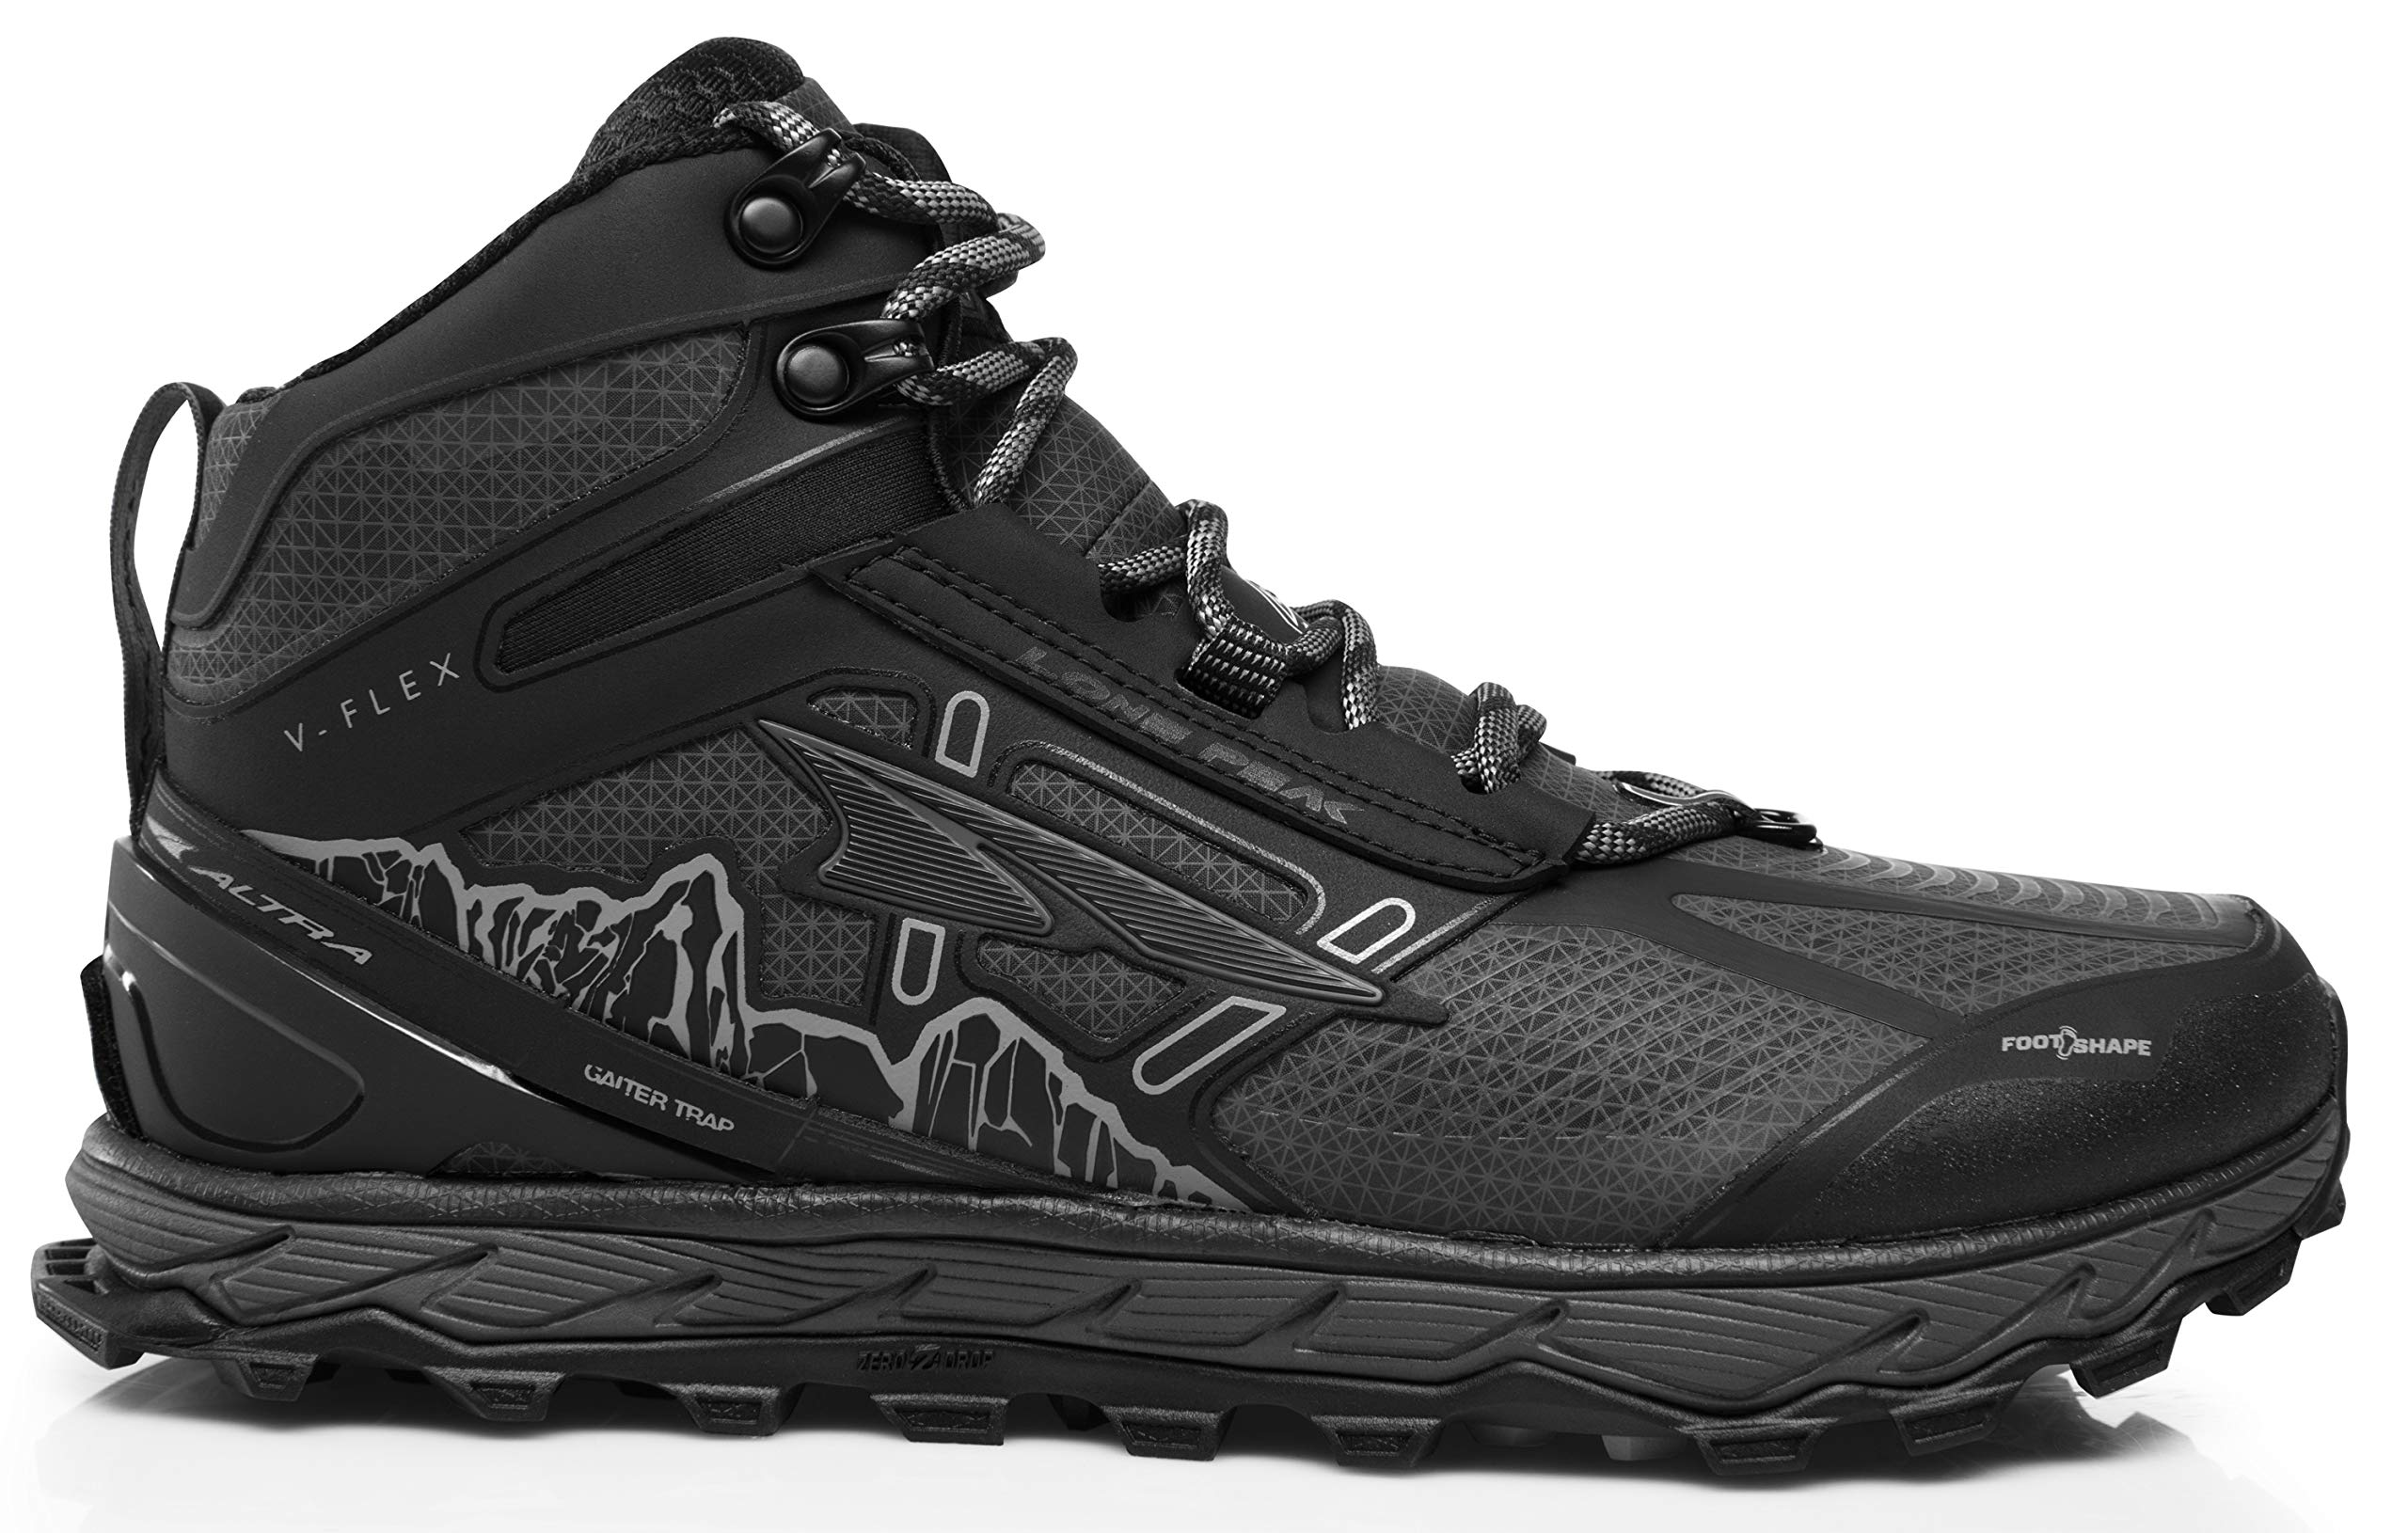 Altra Men's Lone Peak 4 Mid RSM Waterproof Trail Running Shoe, Black - 12 D(M) US by Altra